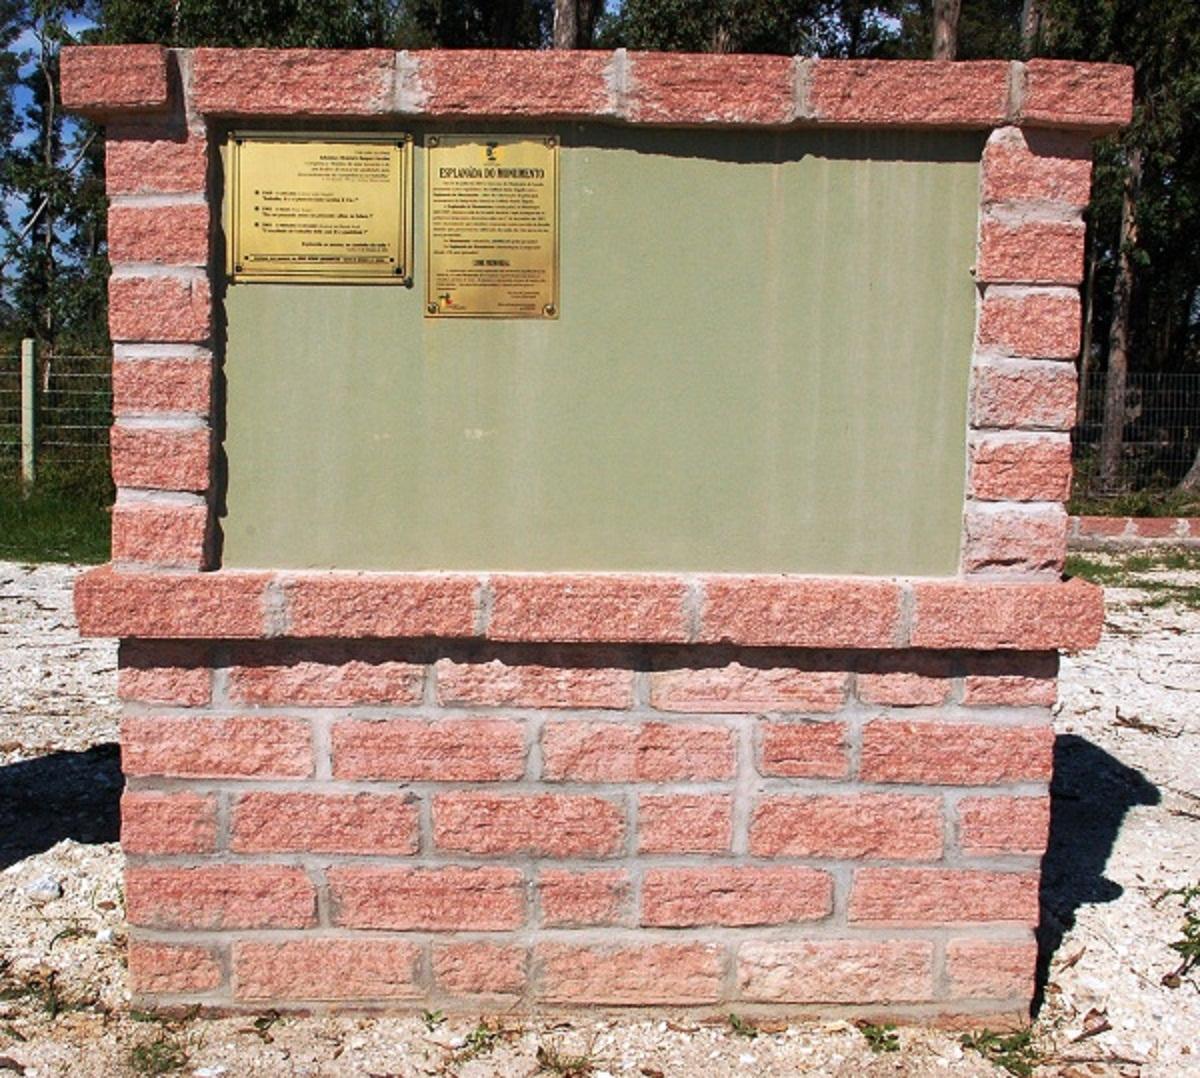 Agudo 025 1200pix Monumento c placas no Cerro Chato